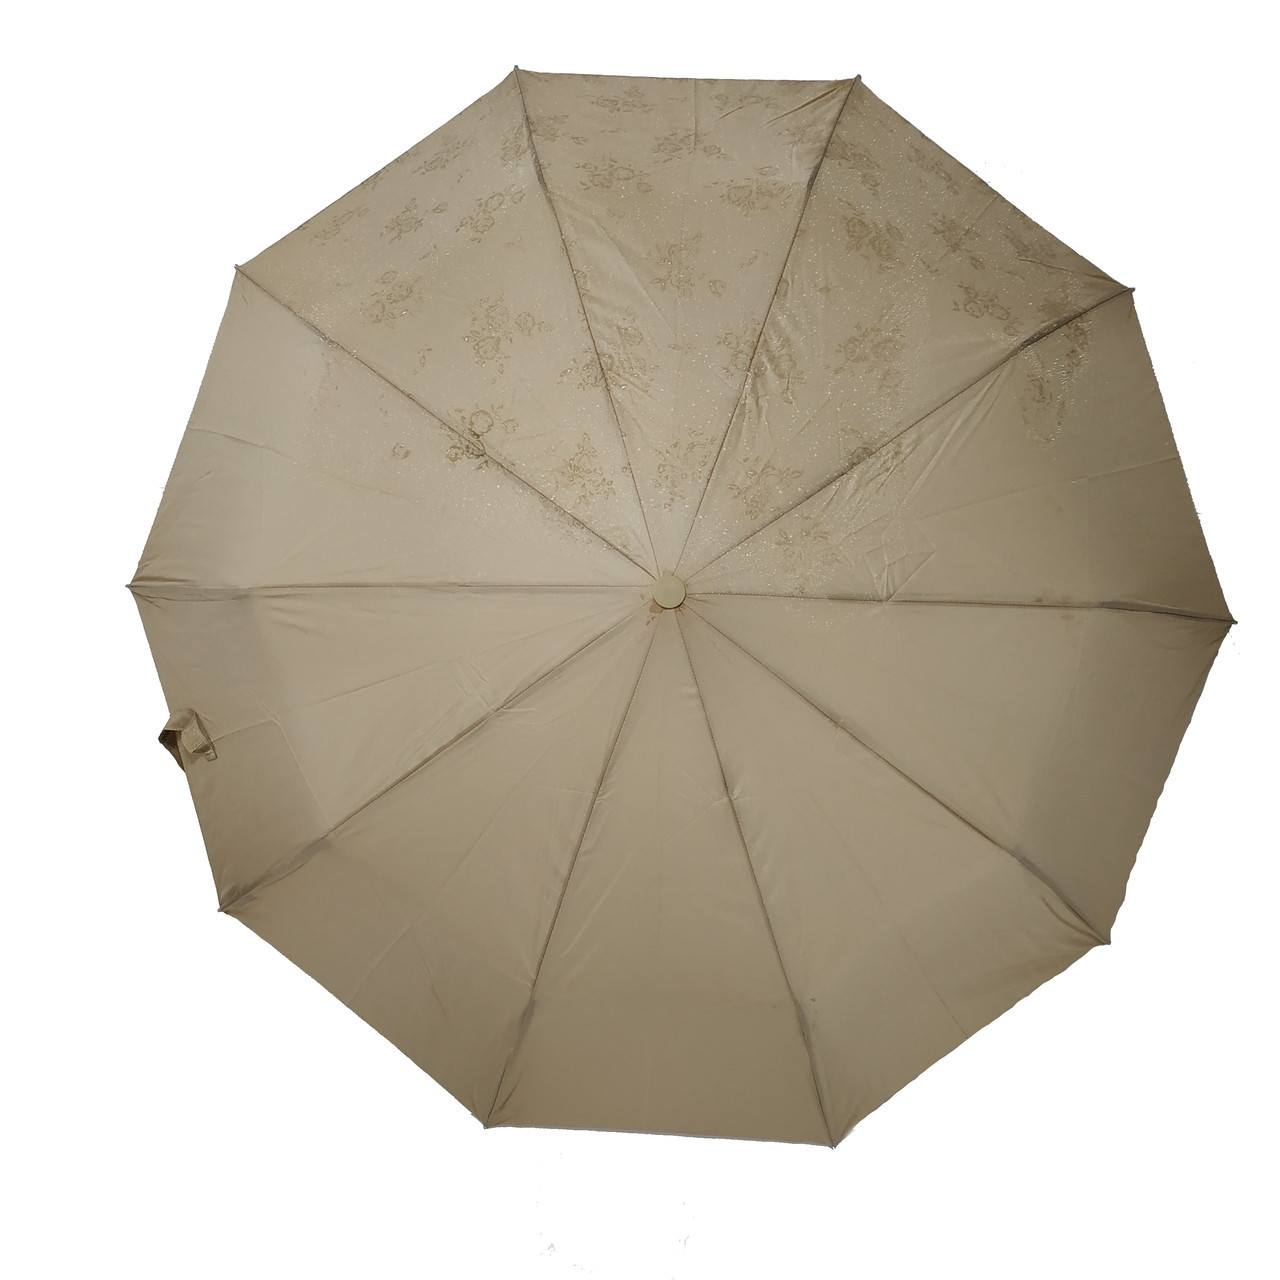 Женский зонтик Bellisimo полуавтомат на 10 спиц Бежевый (461-1)